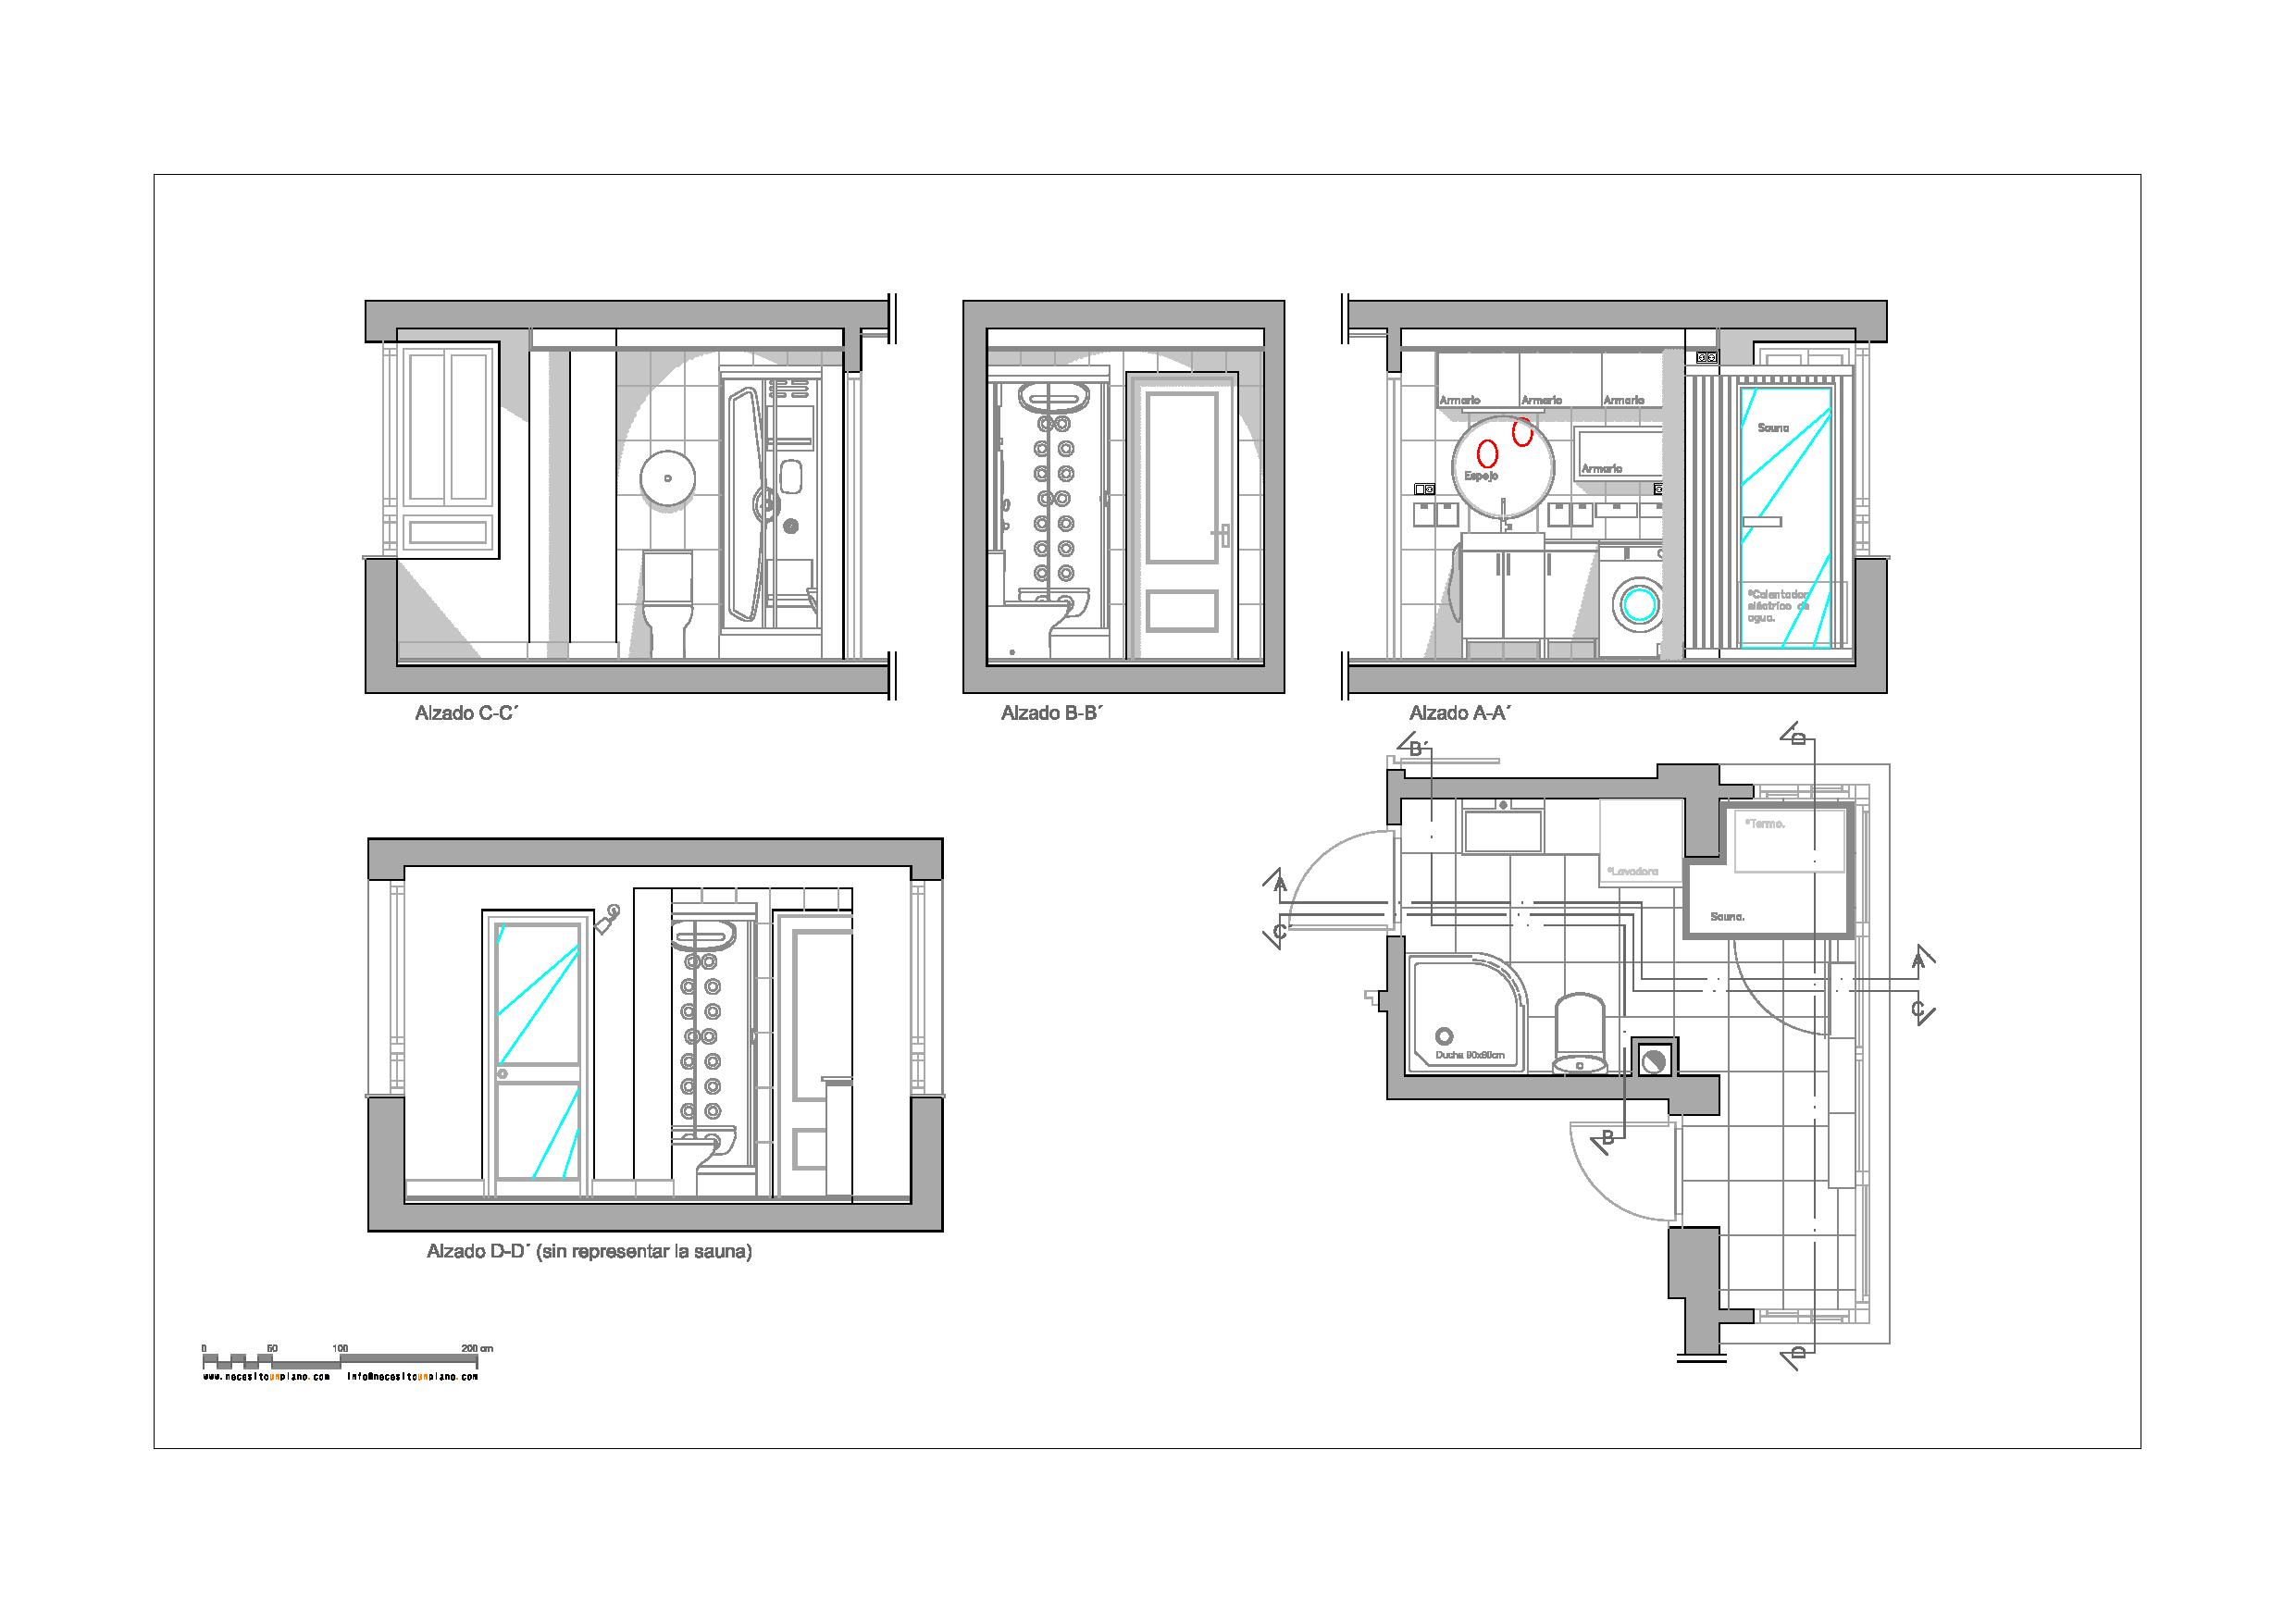 Pin de Irene Parra en Architectural Drawings | Pinterest